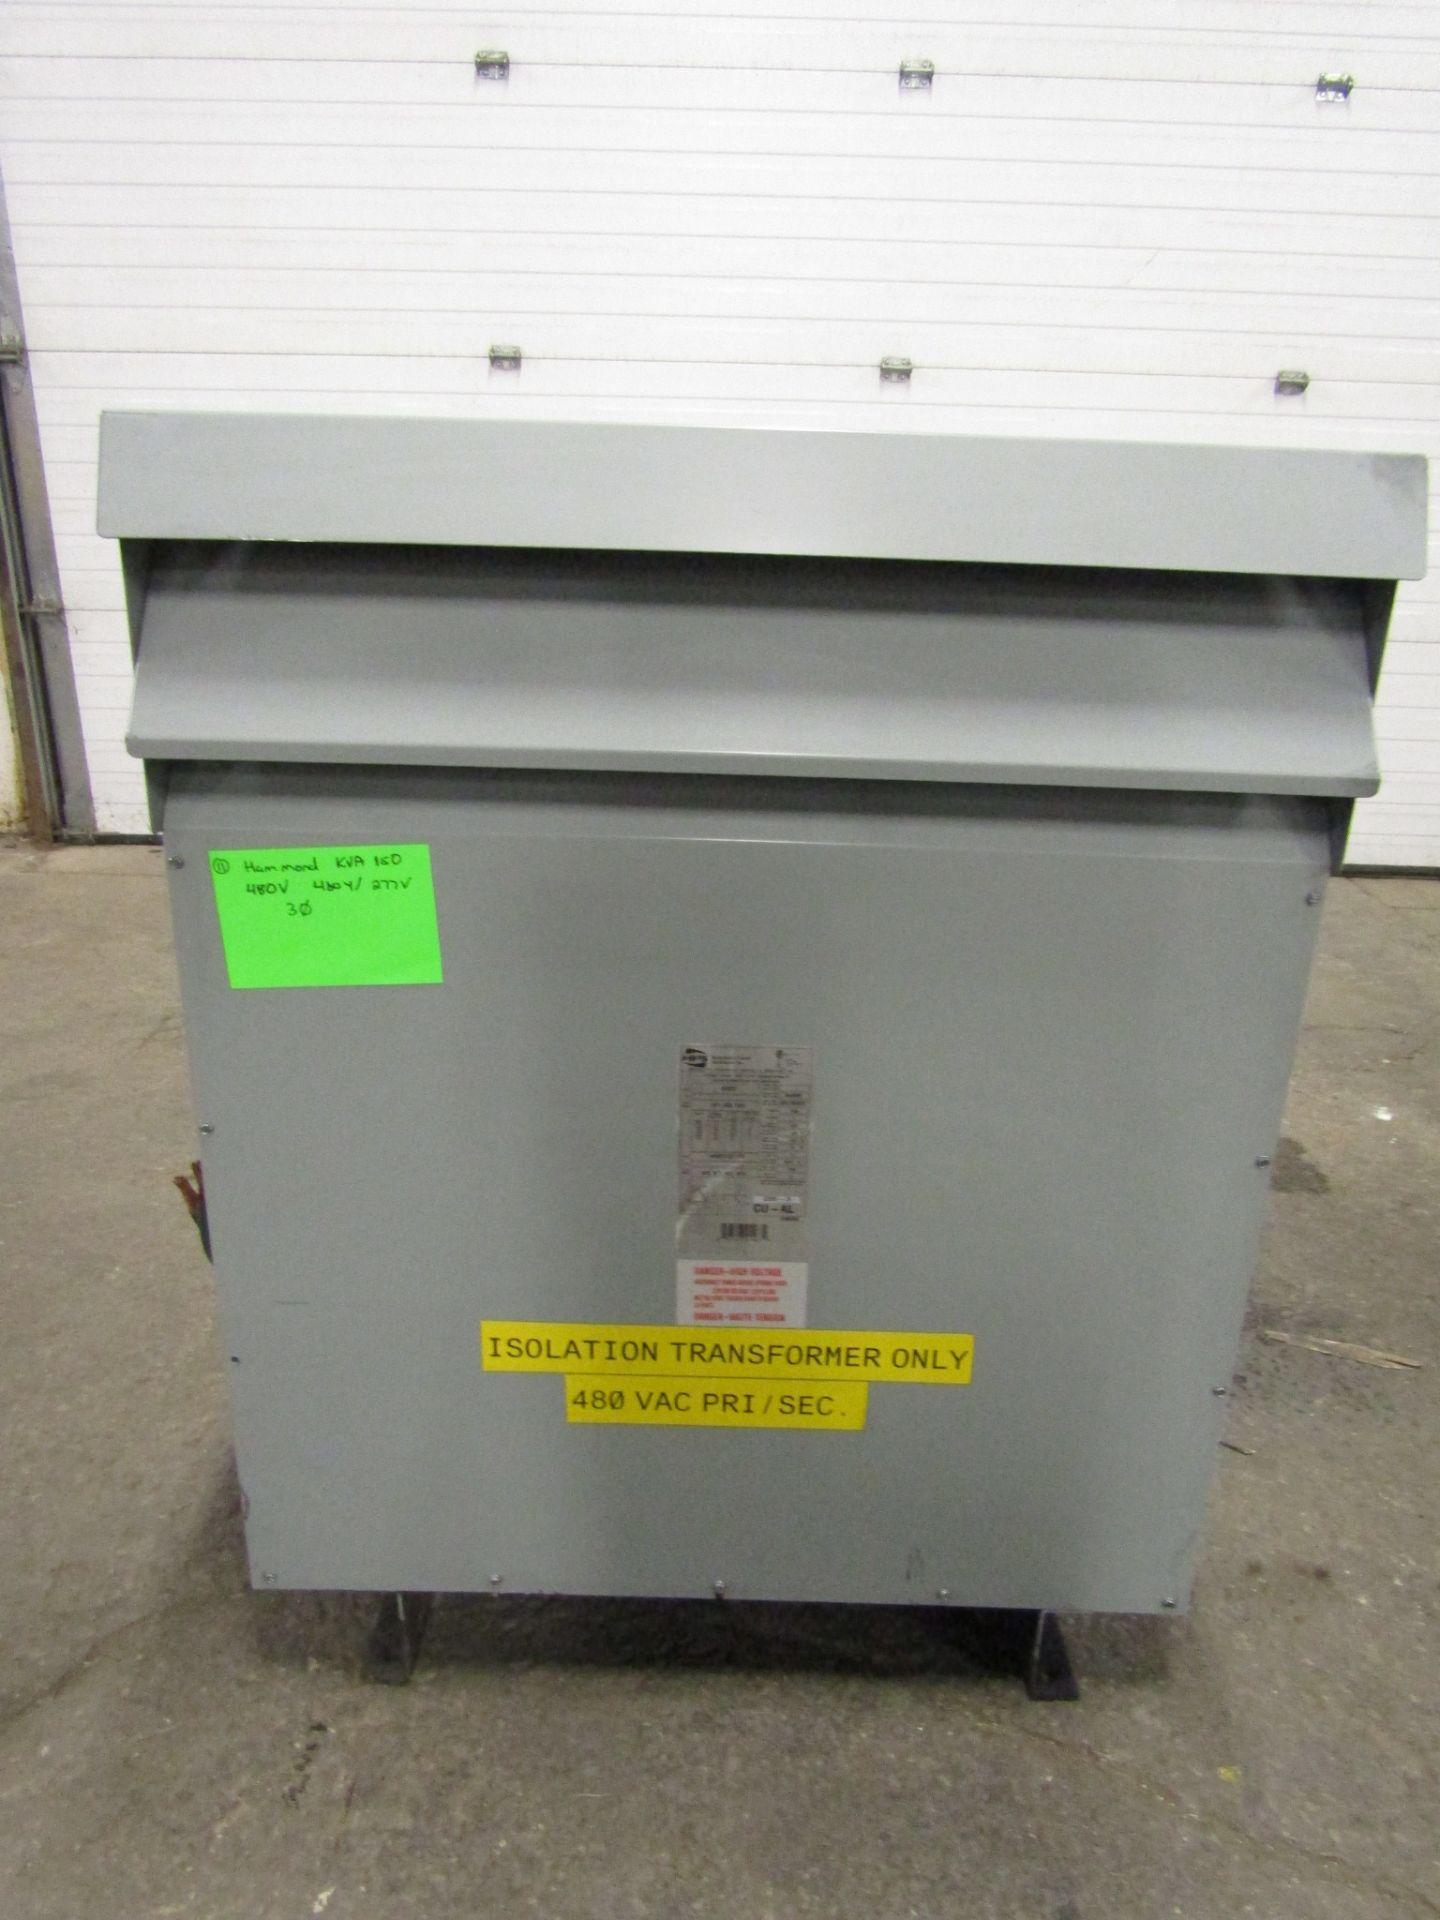 Lotto 295 - Hammond 150 KVA Electrical Transformer - 480V to 480Y / 277V 3 phase